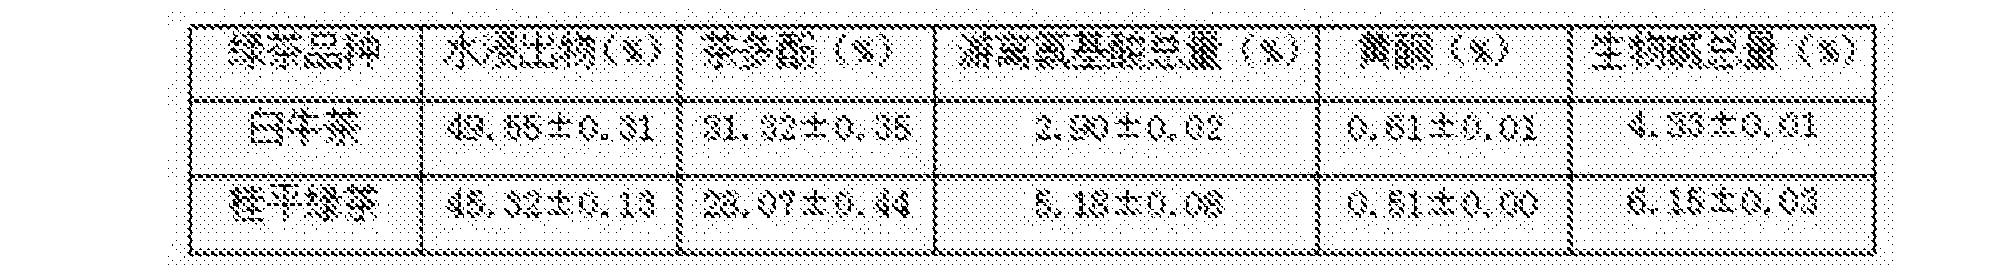 Figure CN108925358AD00061